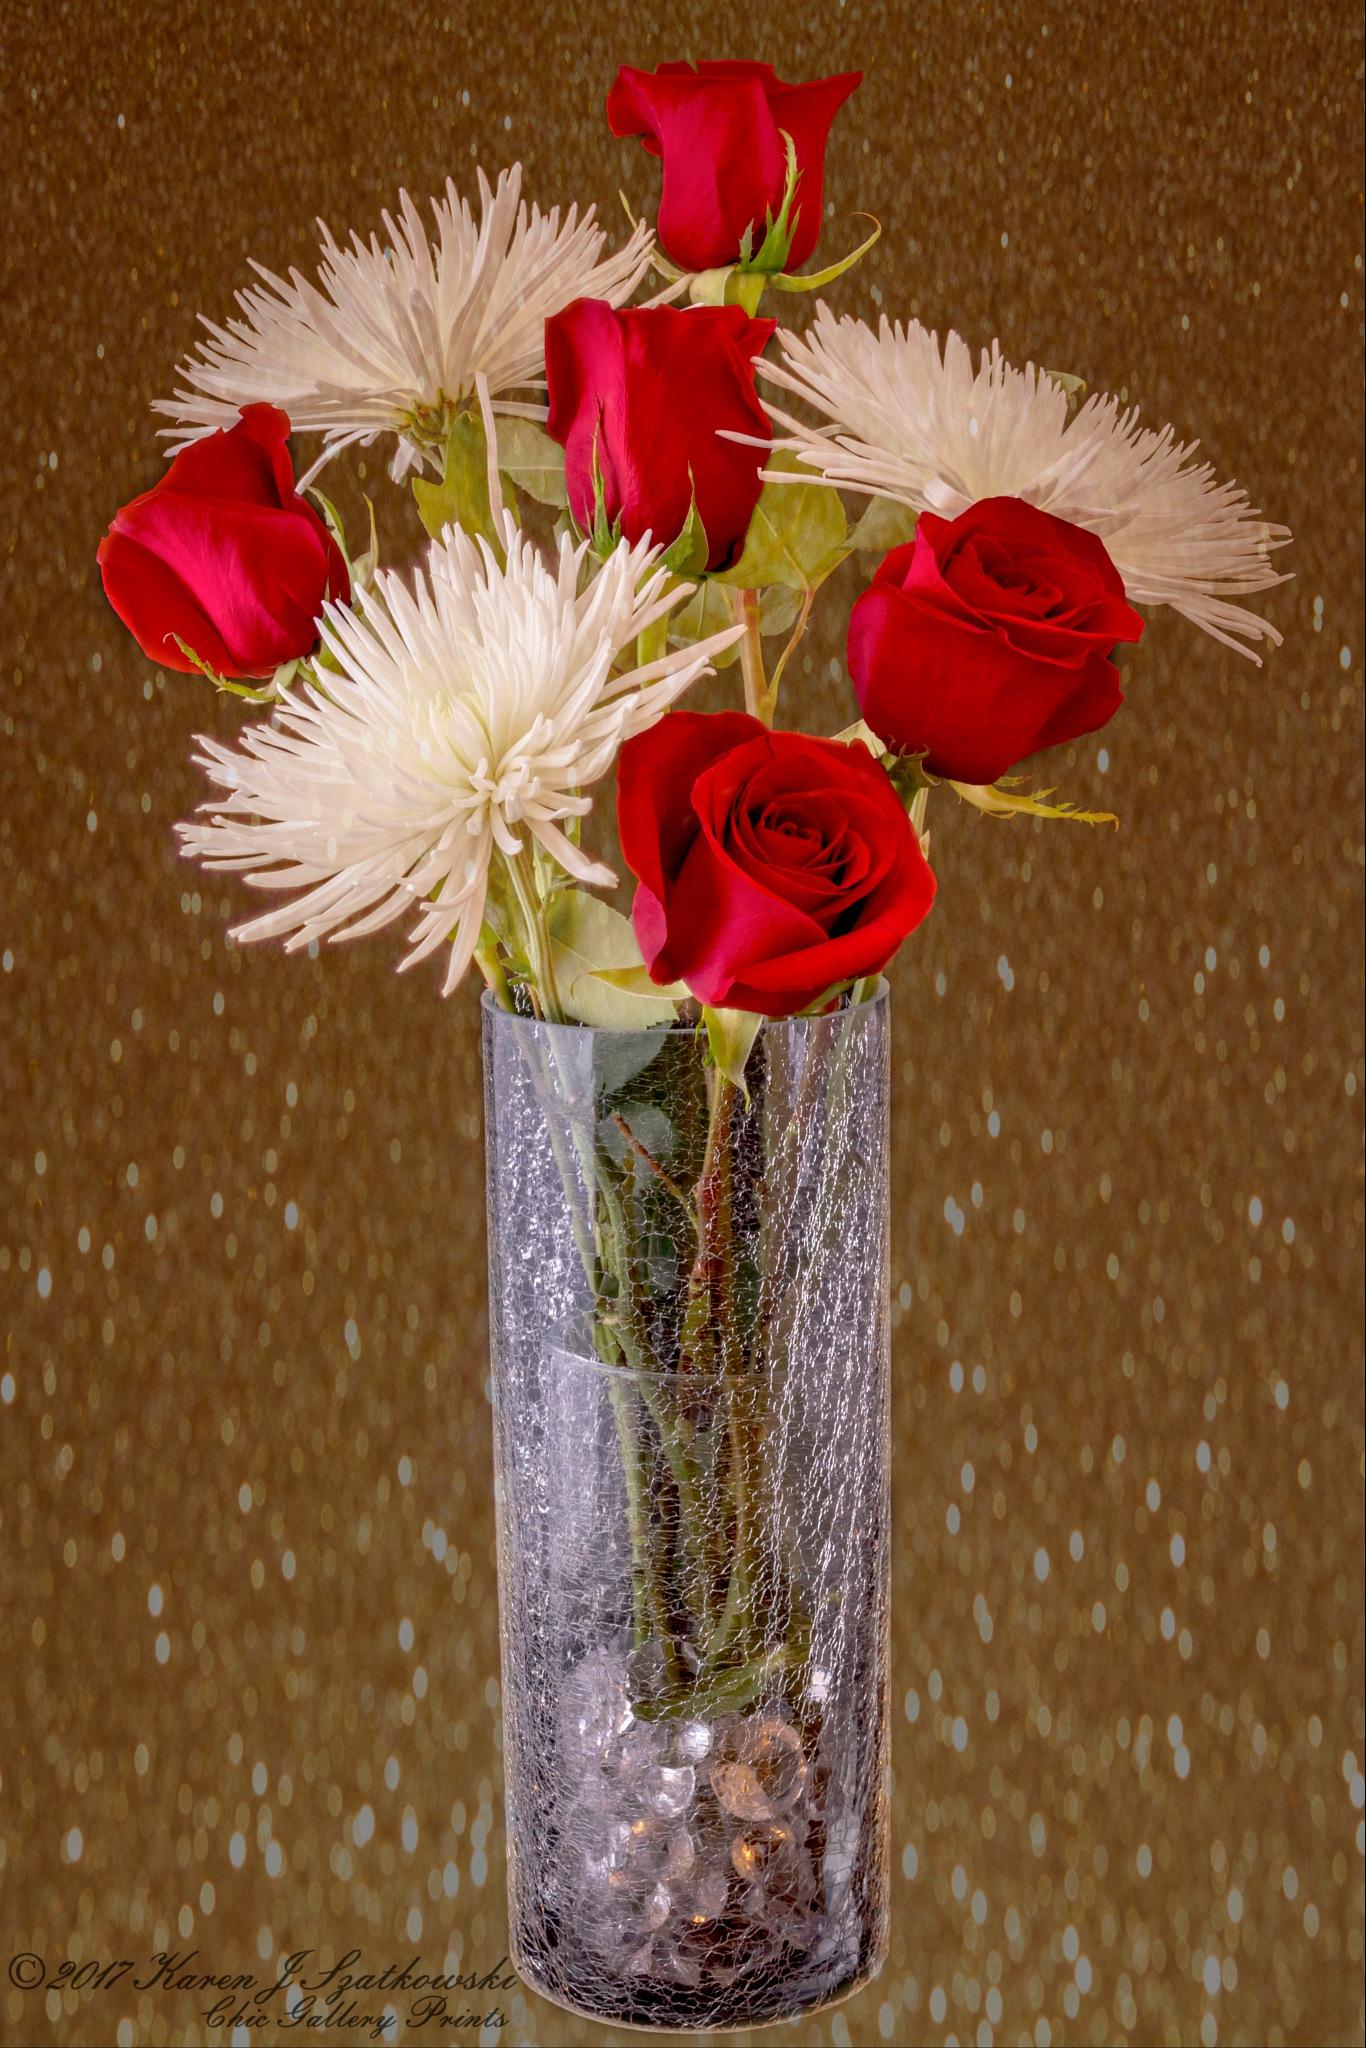 Rose Bouquet by Karen J. Garlock-Szatkowski